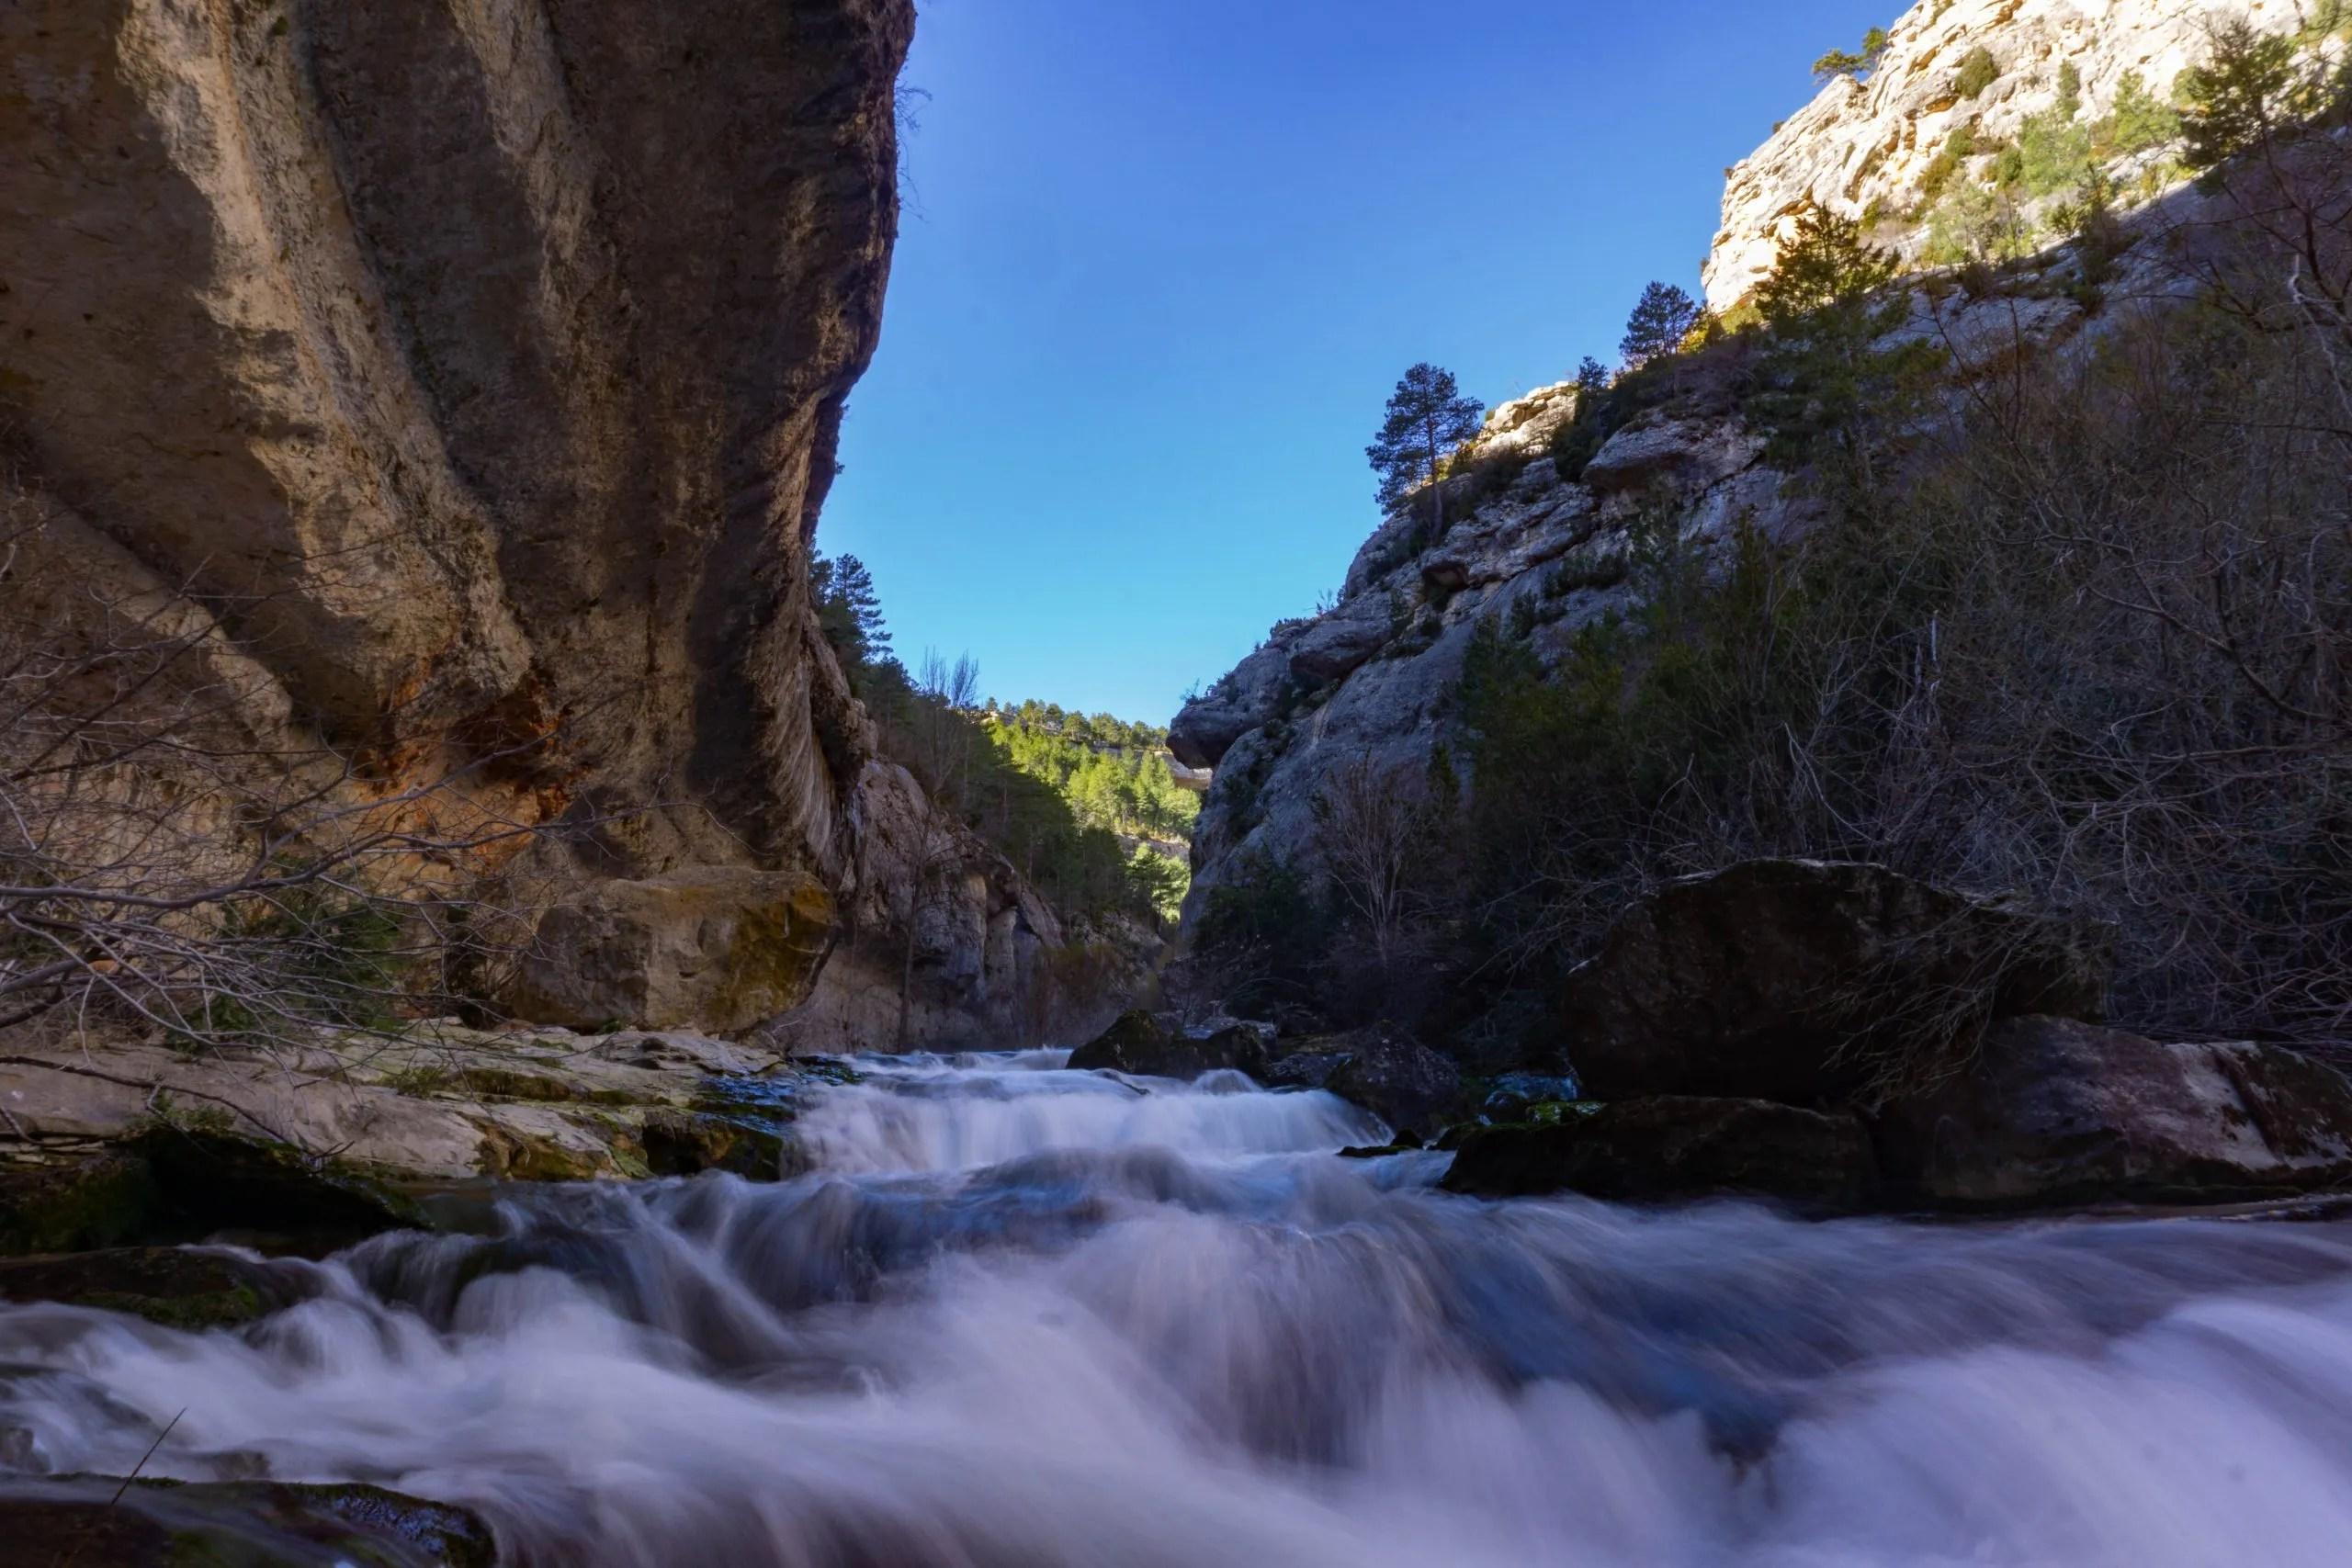 A la source du río Pitarque